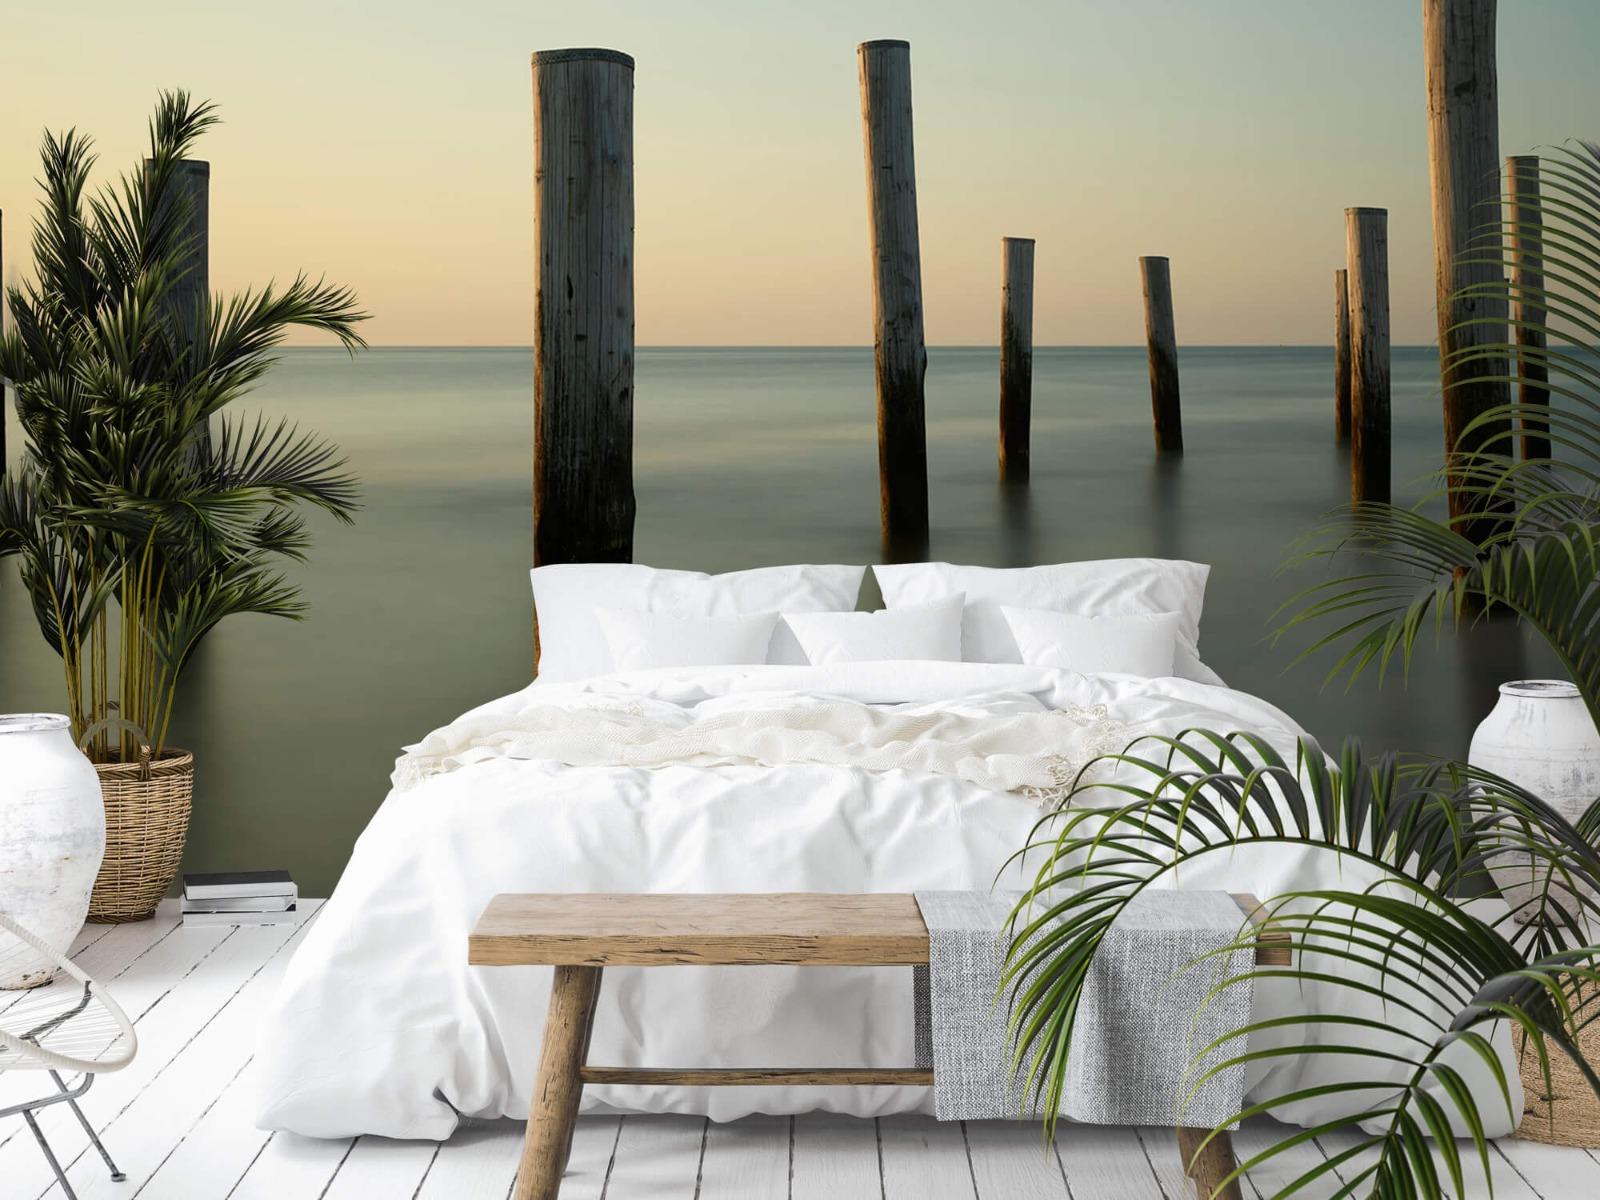 Zeeën en Oceanen - Houten strandpalen - Slaapkamer 4